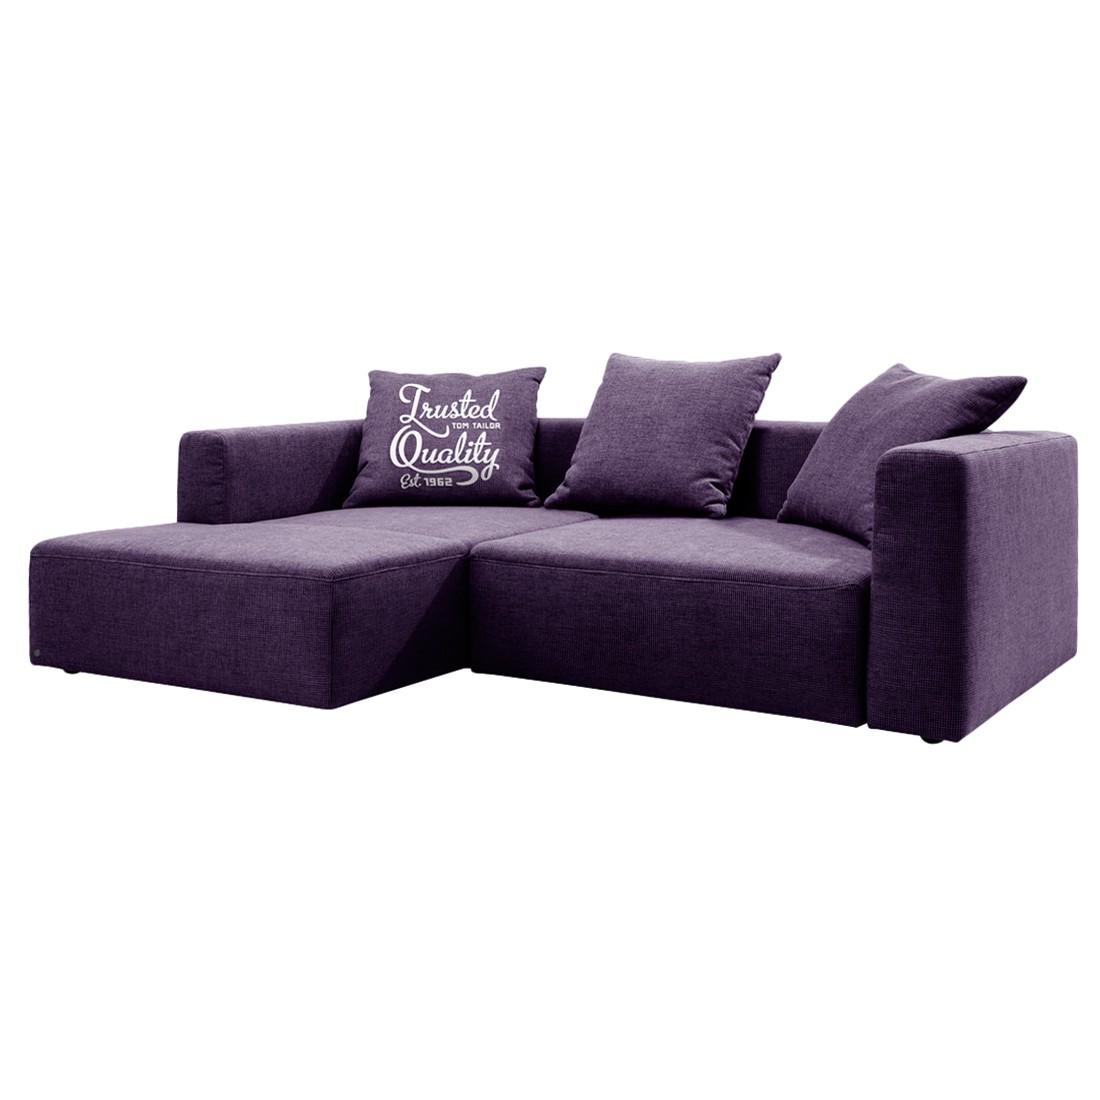 lila ecksofa g nstig kaufen. Black Bedroom Furniture Sets. Home Design Ideas